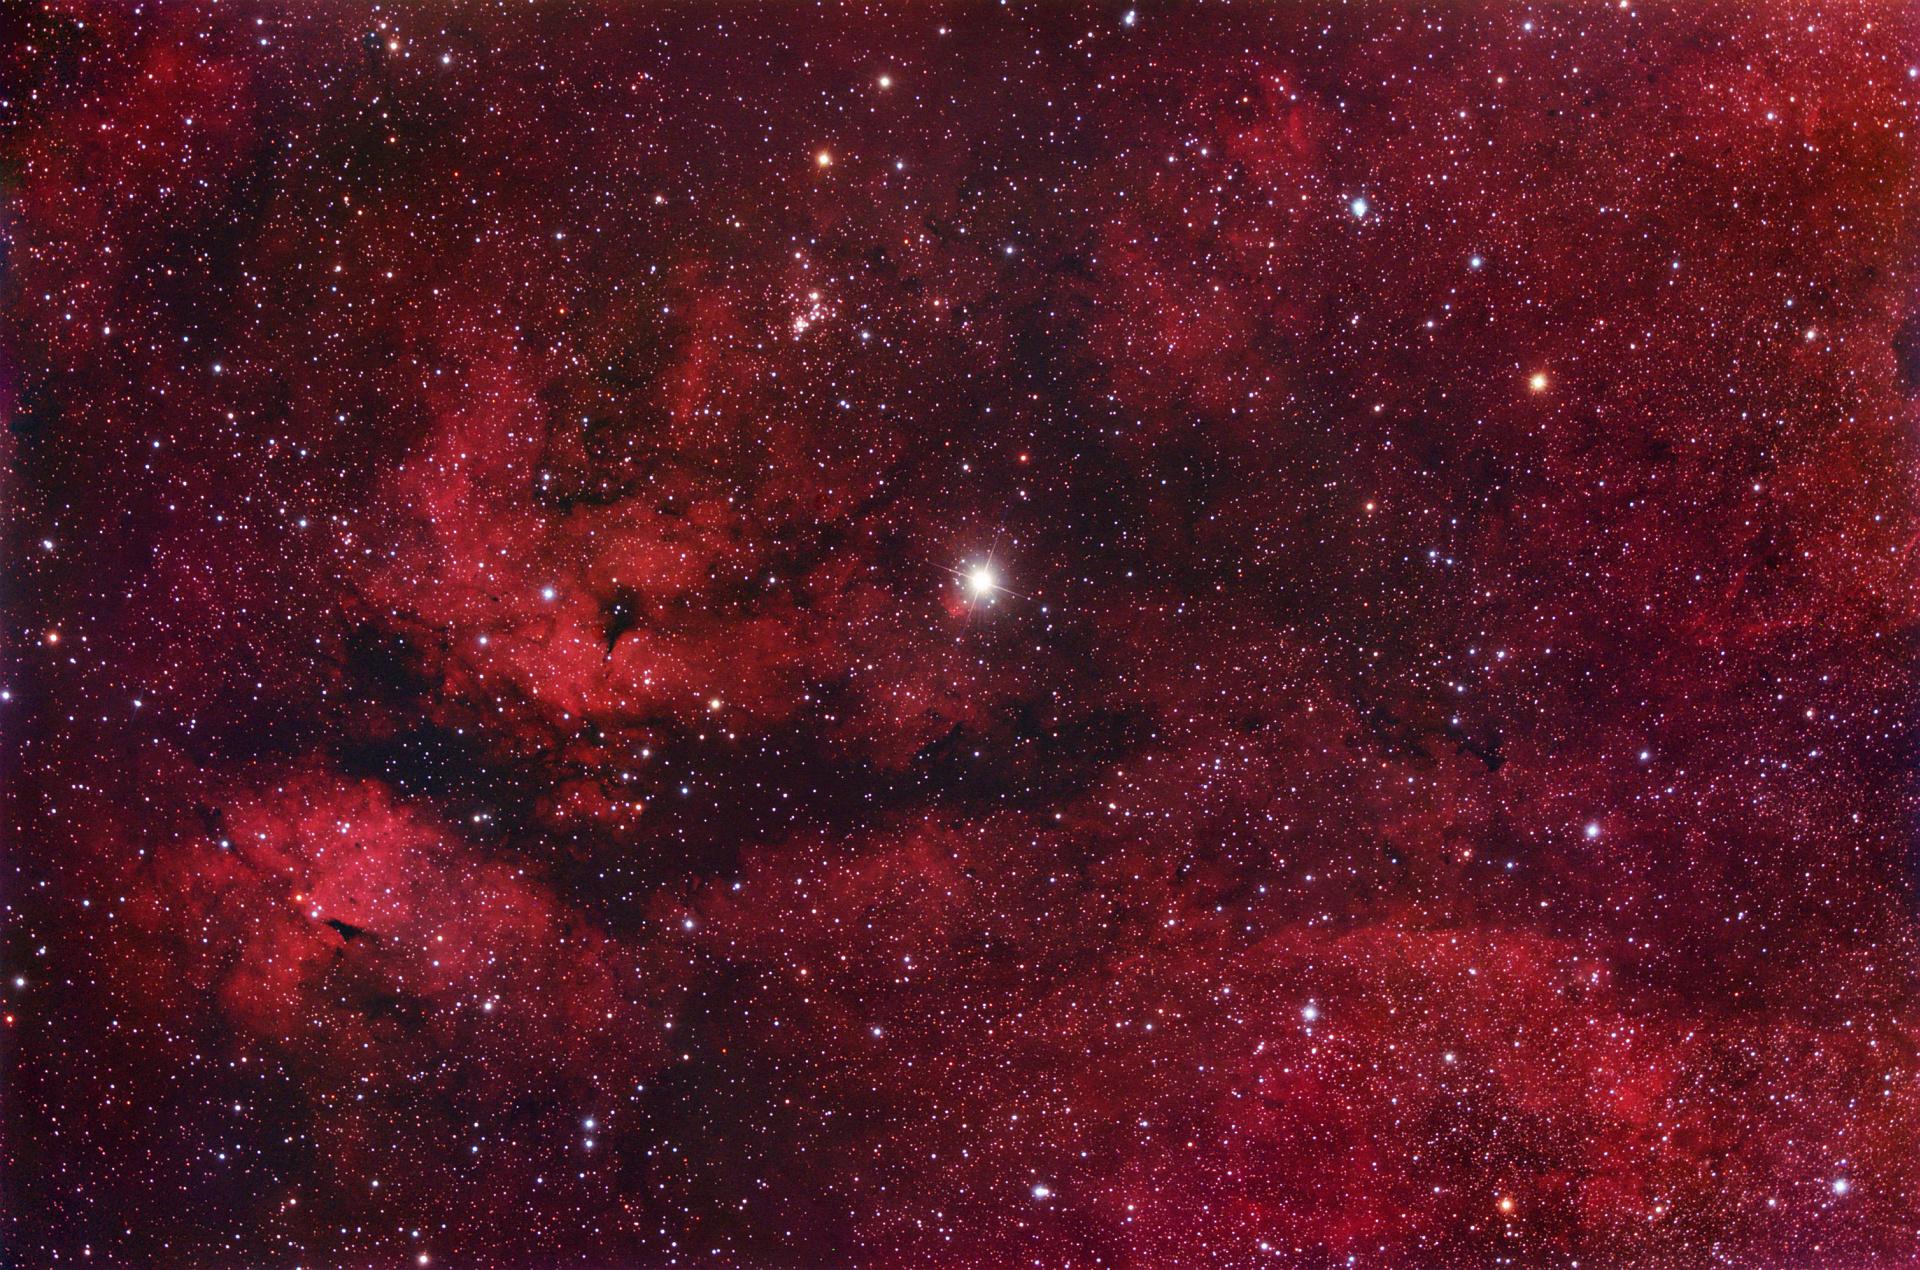 APOD: 2007 January 4 - Central Cygnus